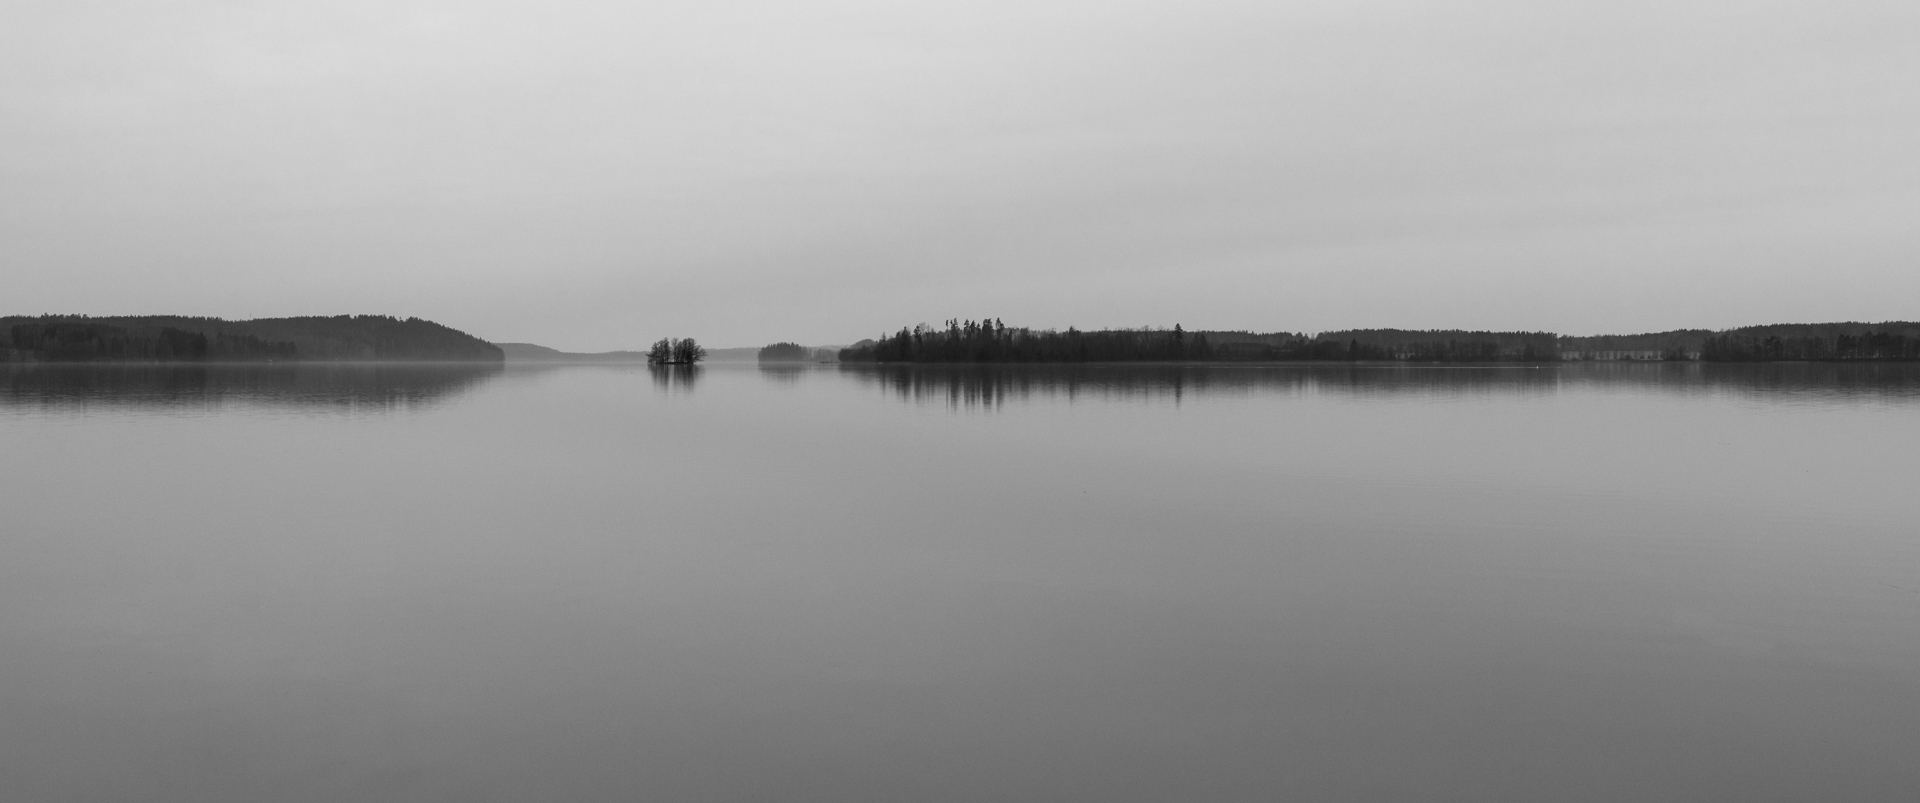 Lake Pyhäjärvi - photography, seascape - anttitassberg | ello